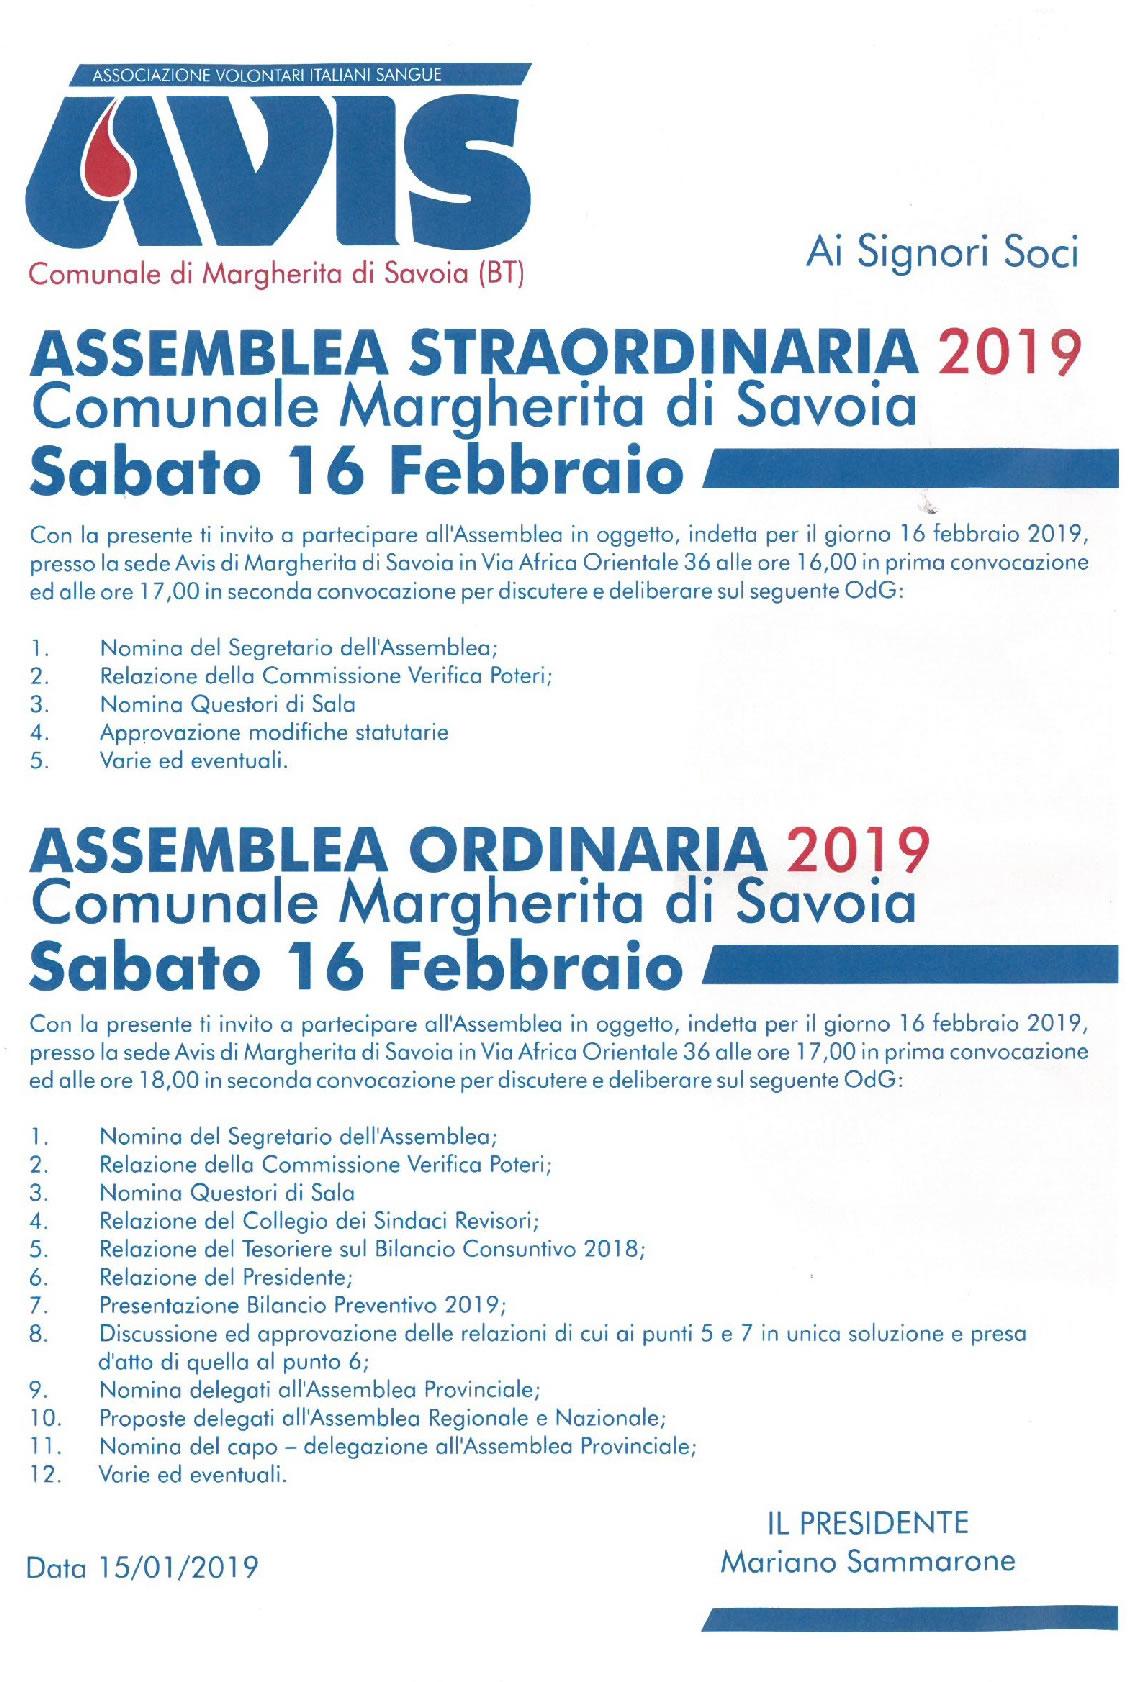 Assemblea ordinaria e straordinaria 2019